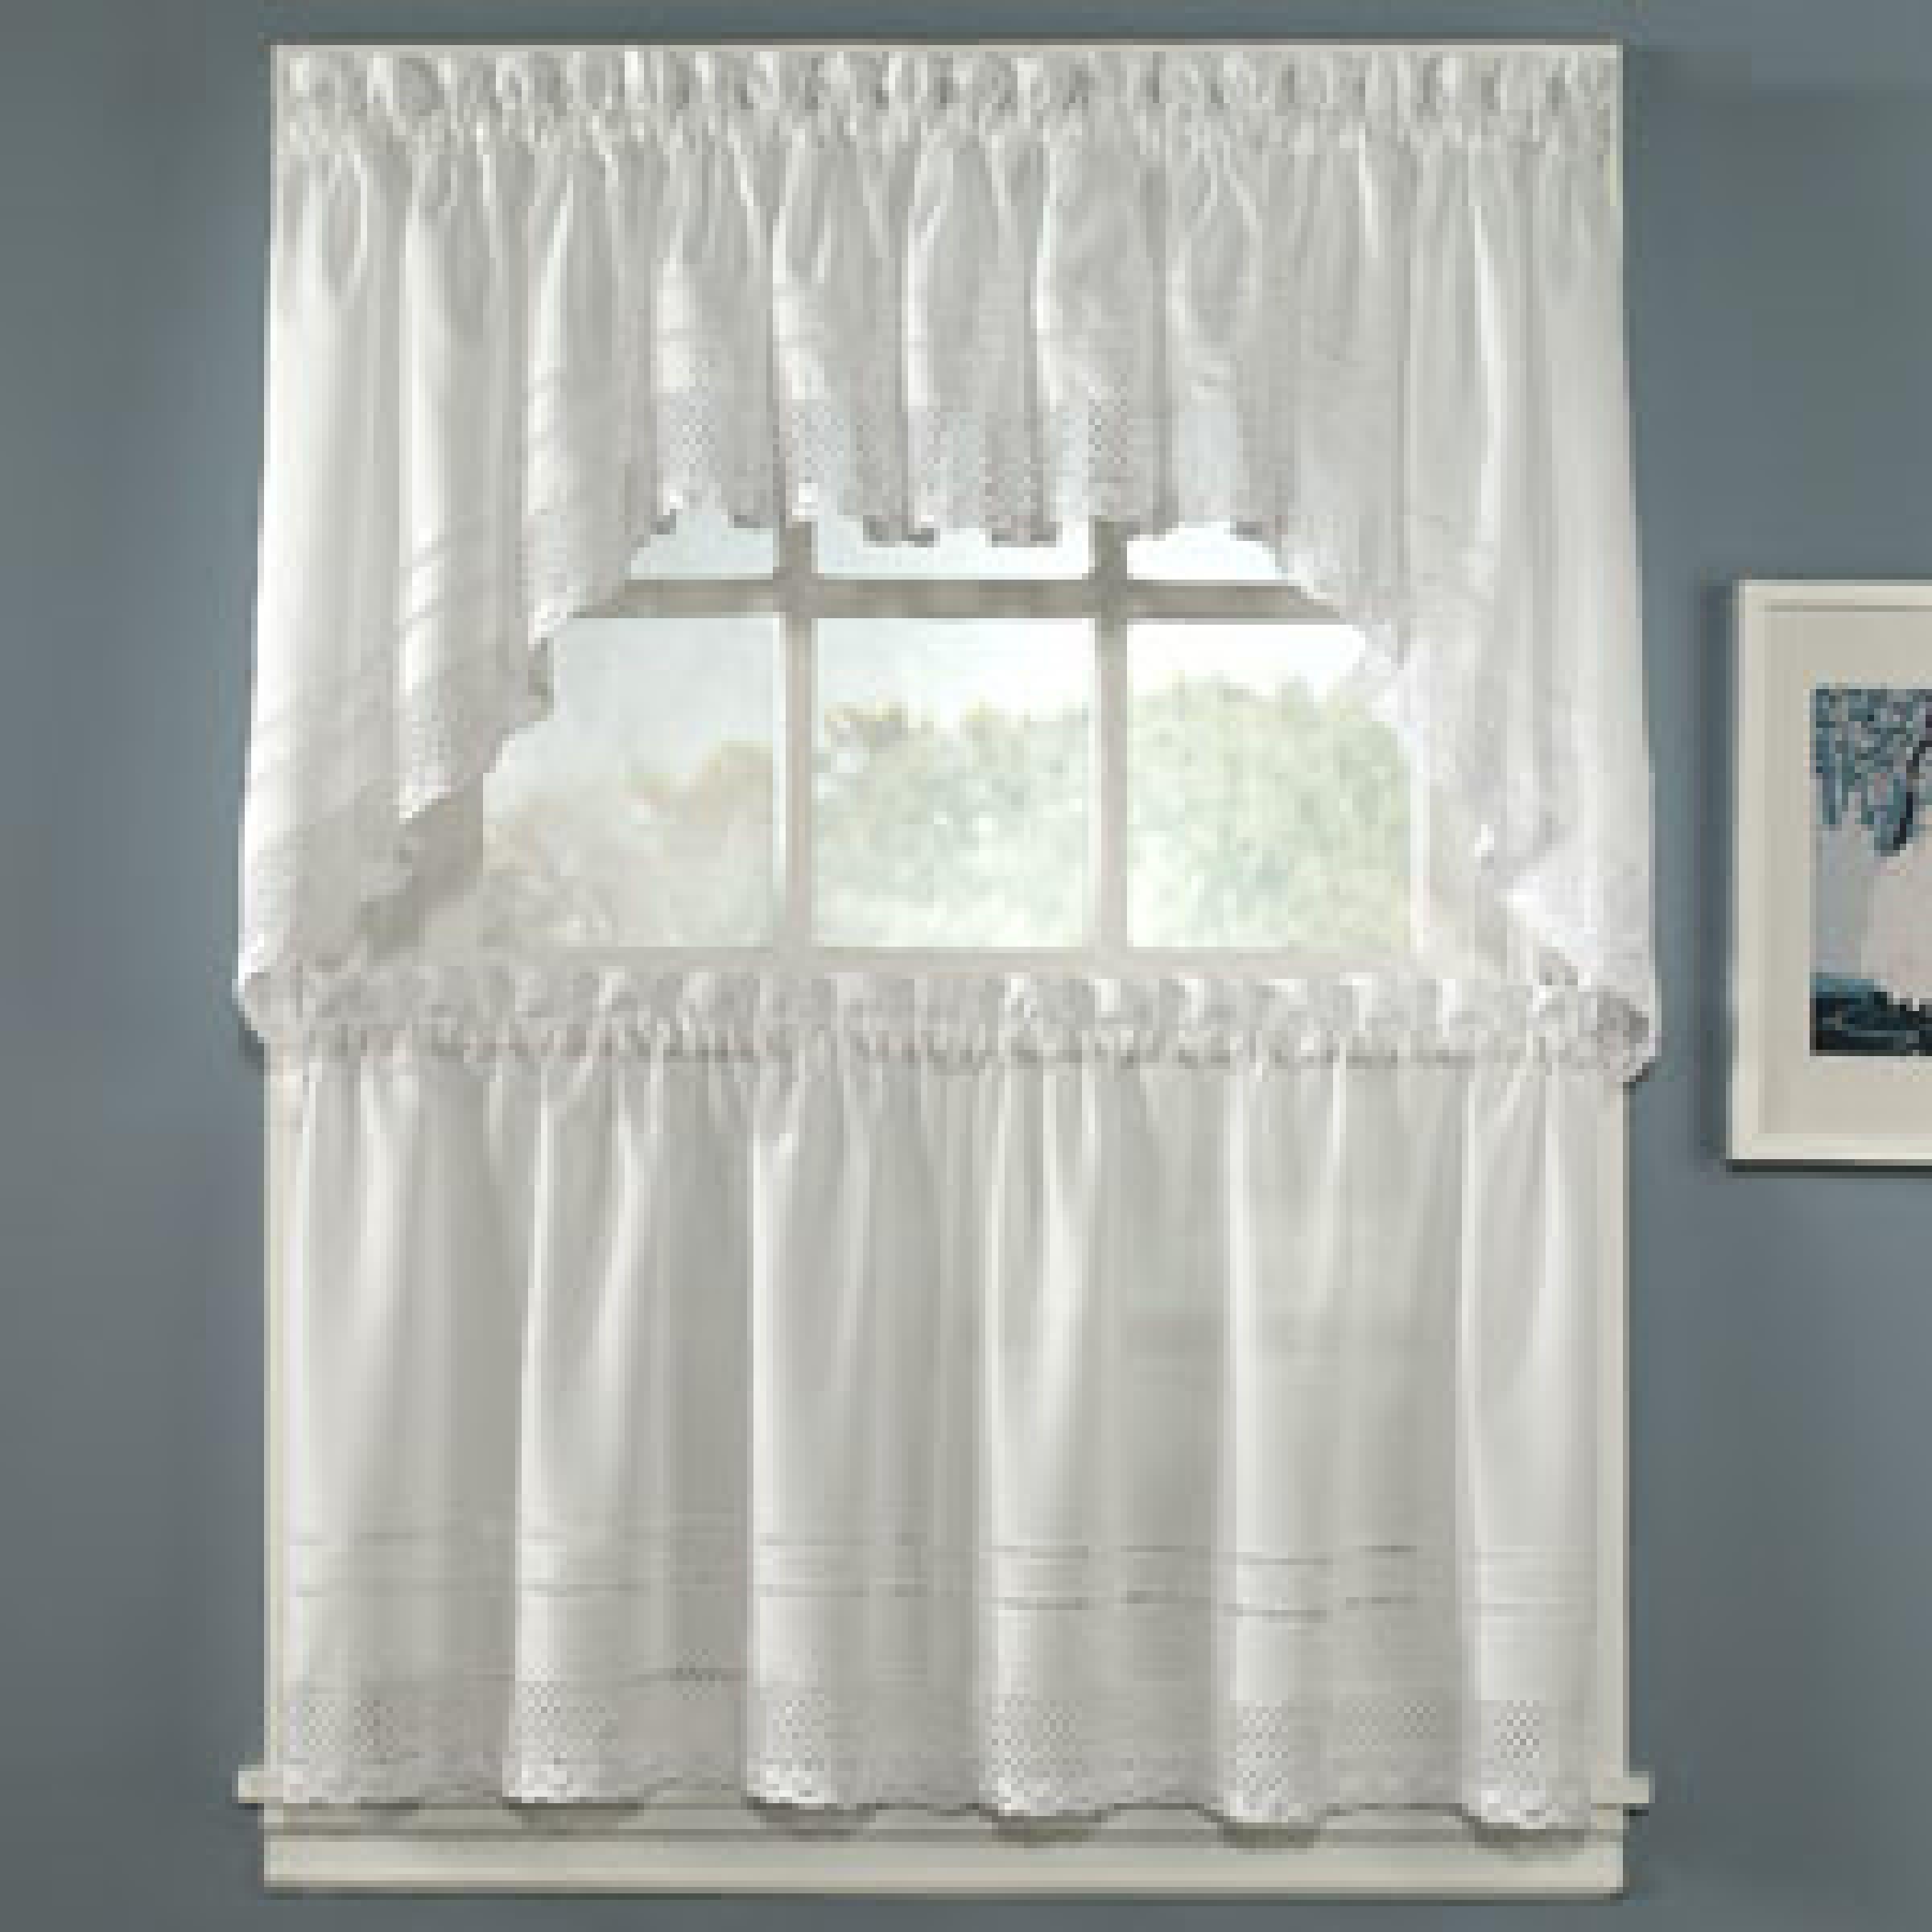 Crochet Trim W Hemstitch Detail Tier Boscov S Tier Curtains